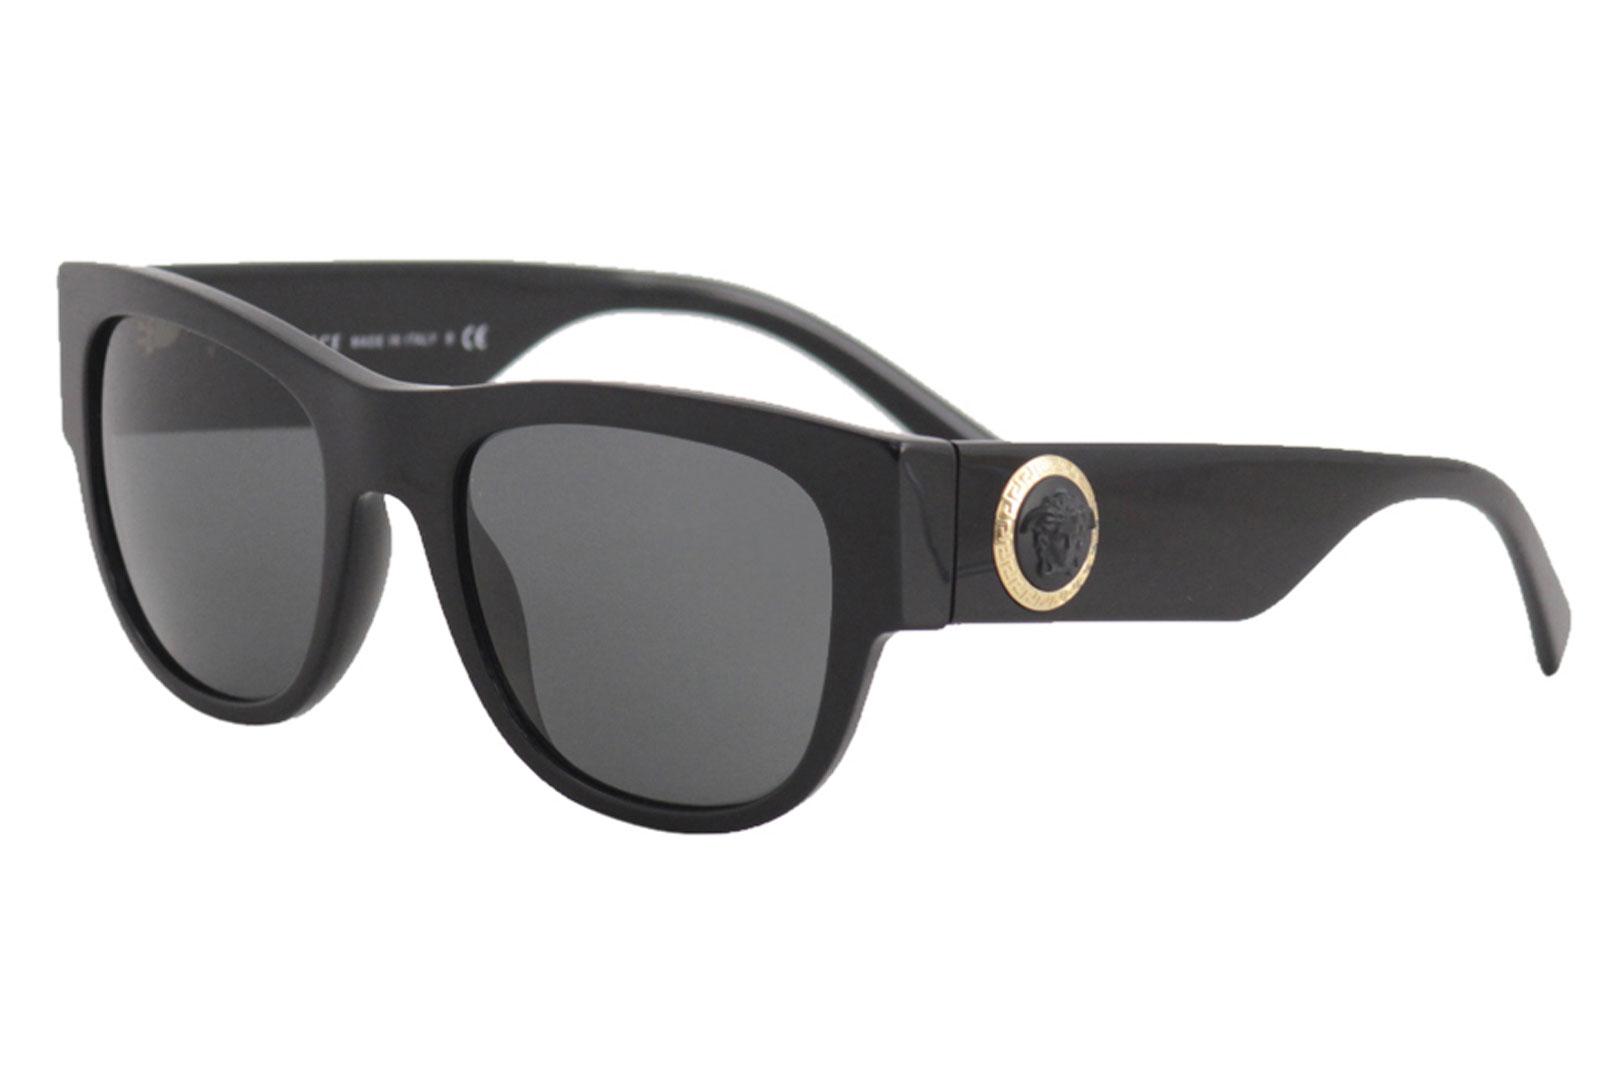 8eff49744d Versace Men s VE4359 VE 4359 GB1 87 Black Fashion Square Sunglasses ...